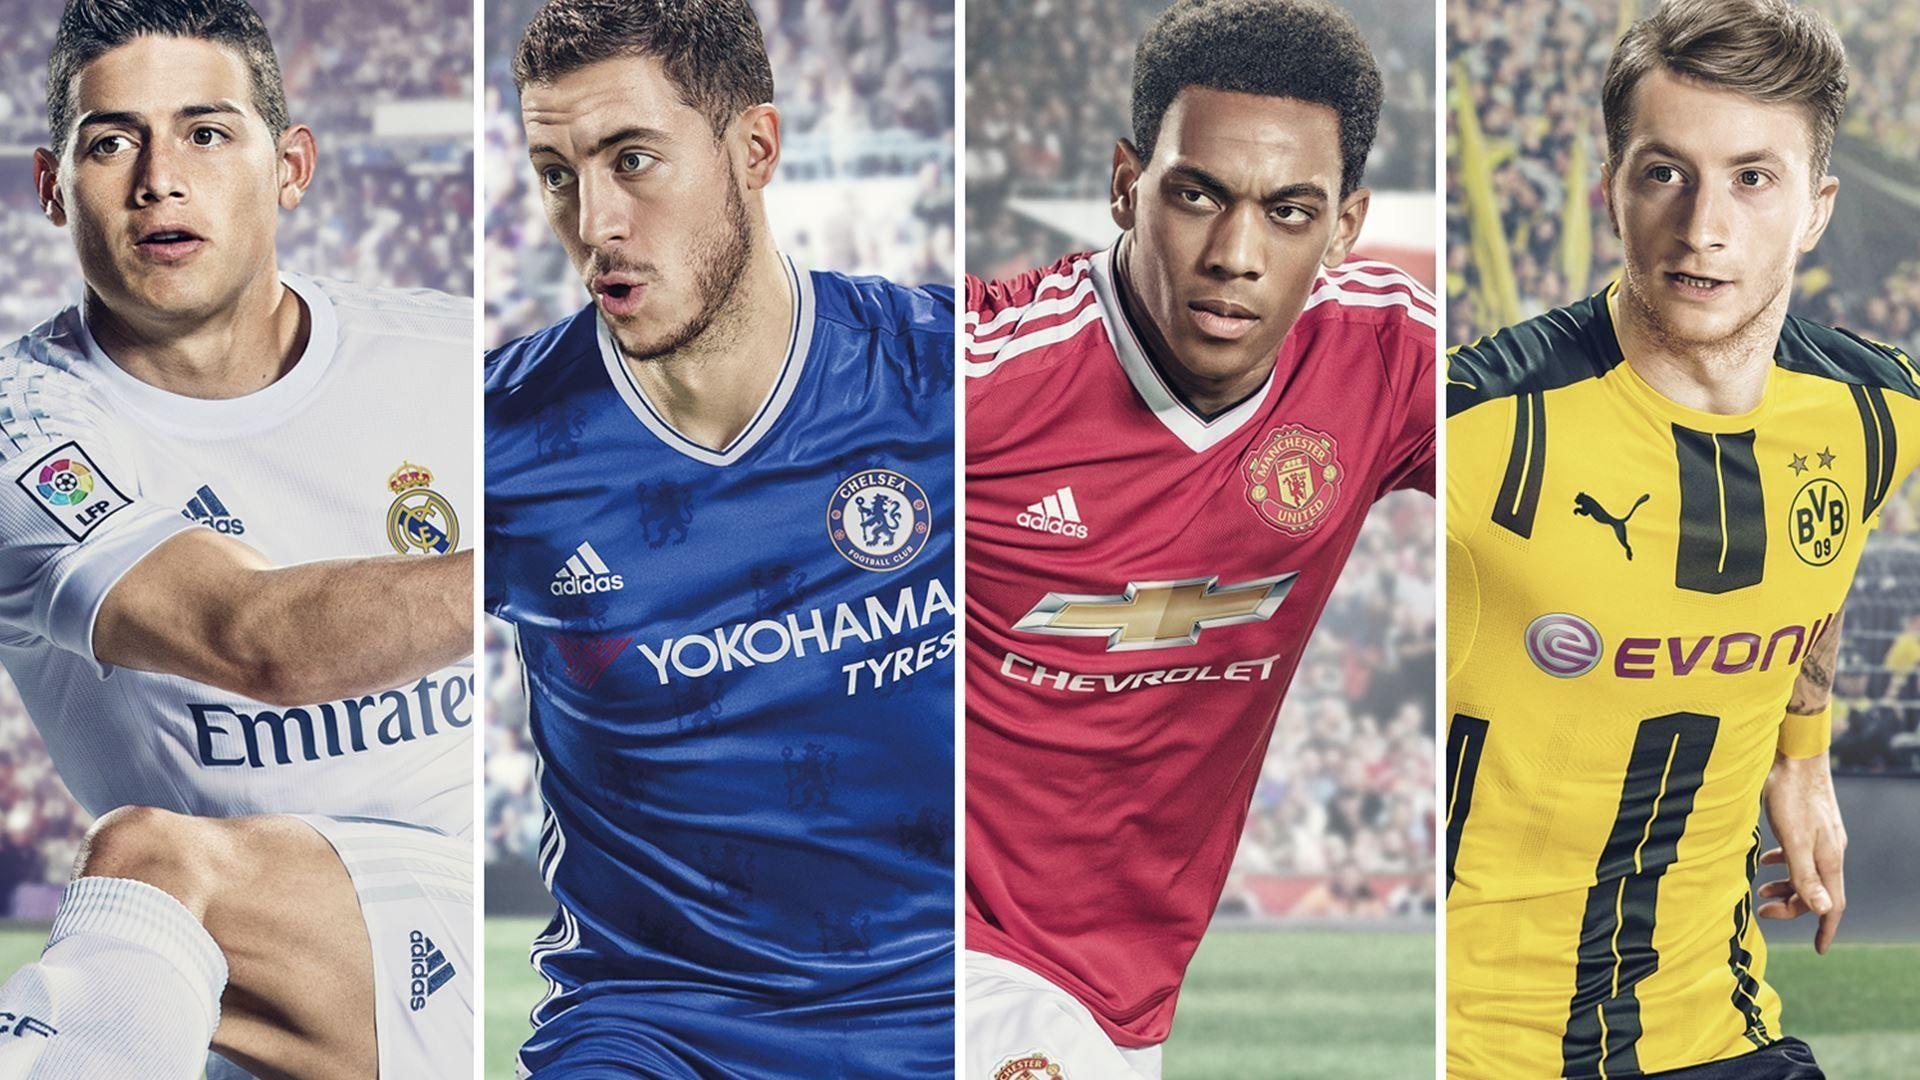 9 FIFA 17 Papéis de Parede HD | Planos de Fundo - Wallpaper Abyss